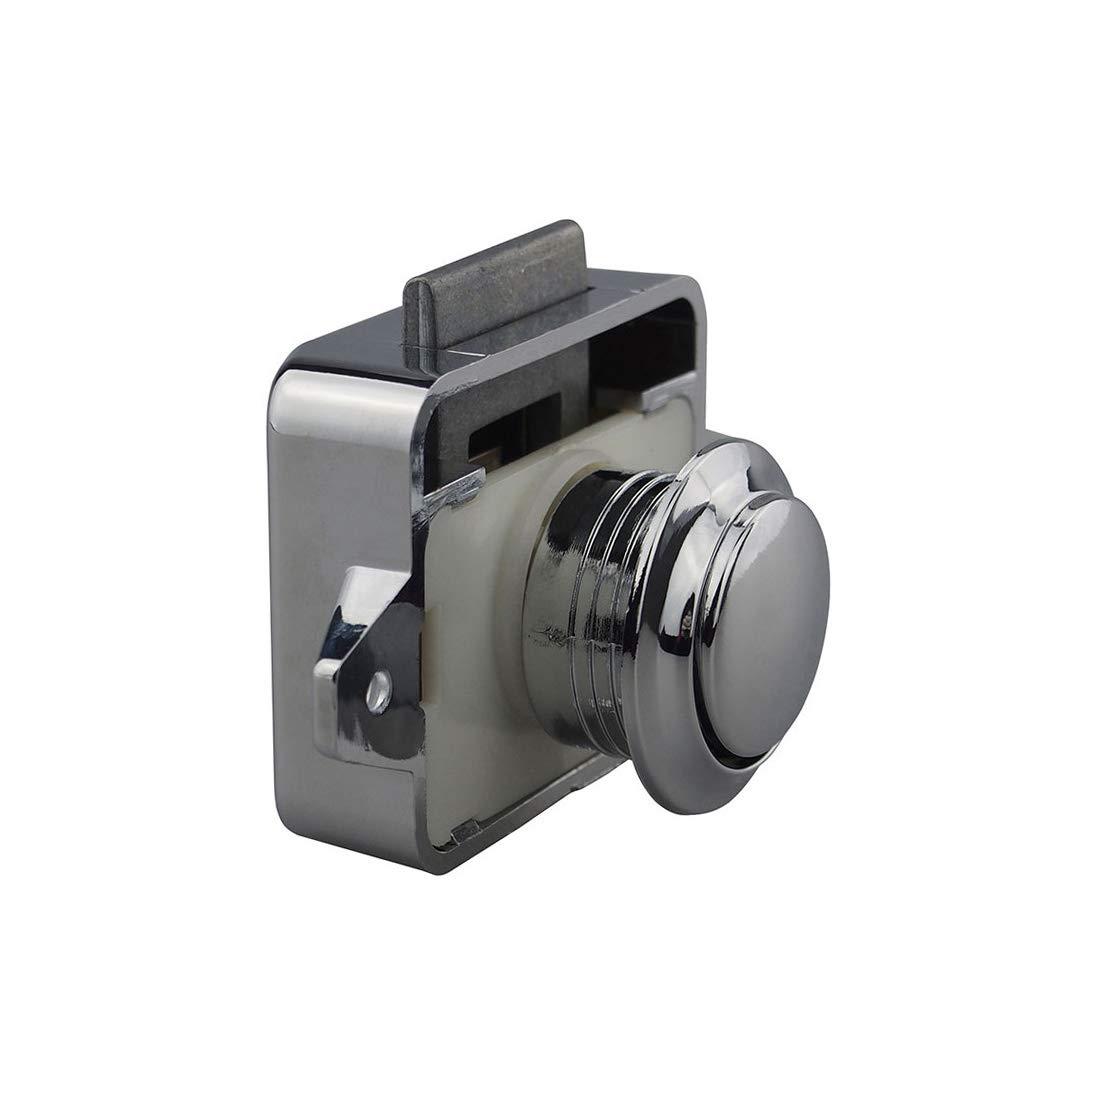 BONA 5pcs/lot Plastic Push Button Cabinet Lock For Ambulance RV Caravan Motorhome Cupboard Hospital Furniture Locks Latch